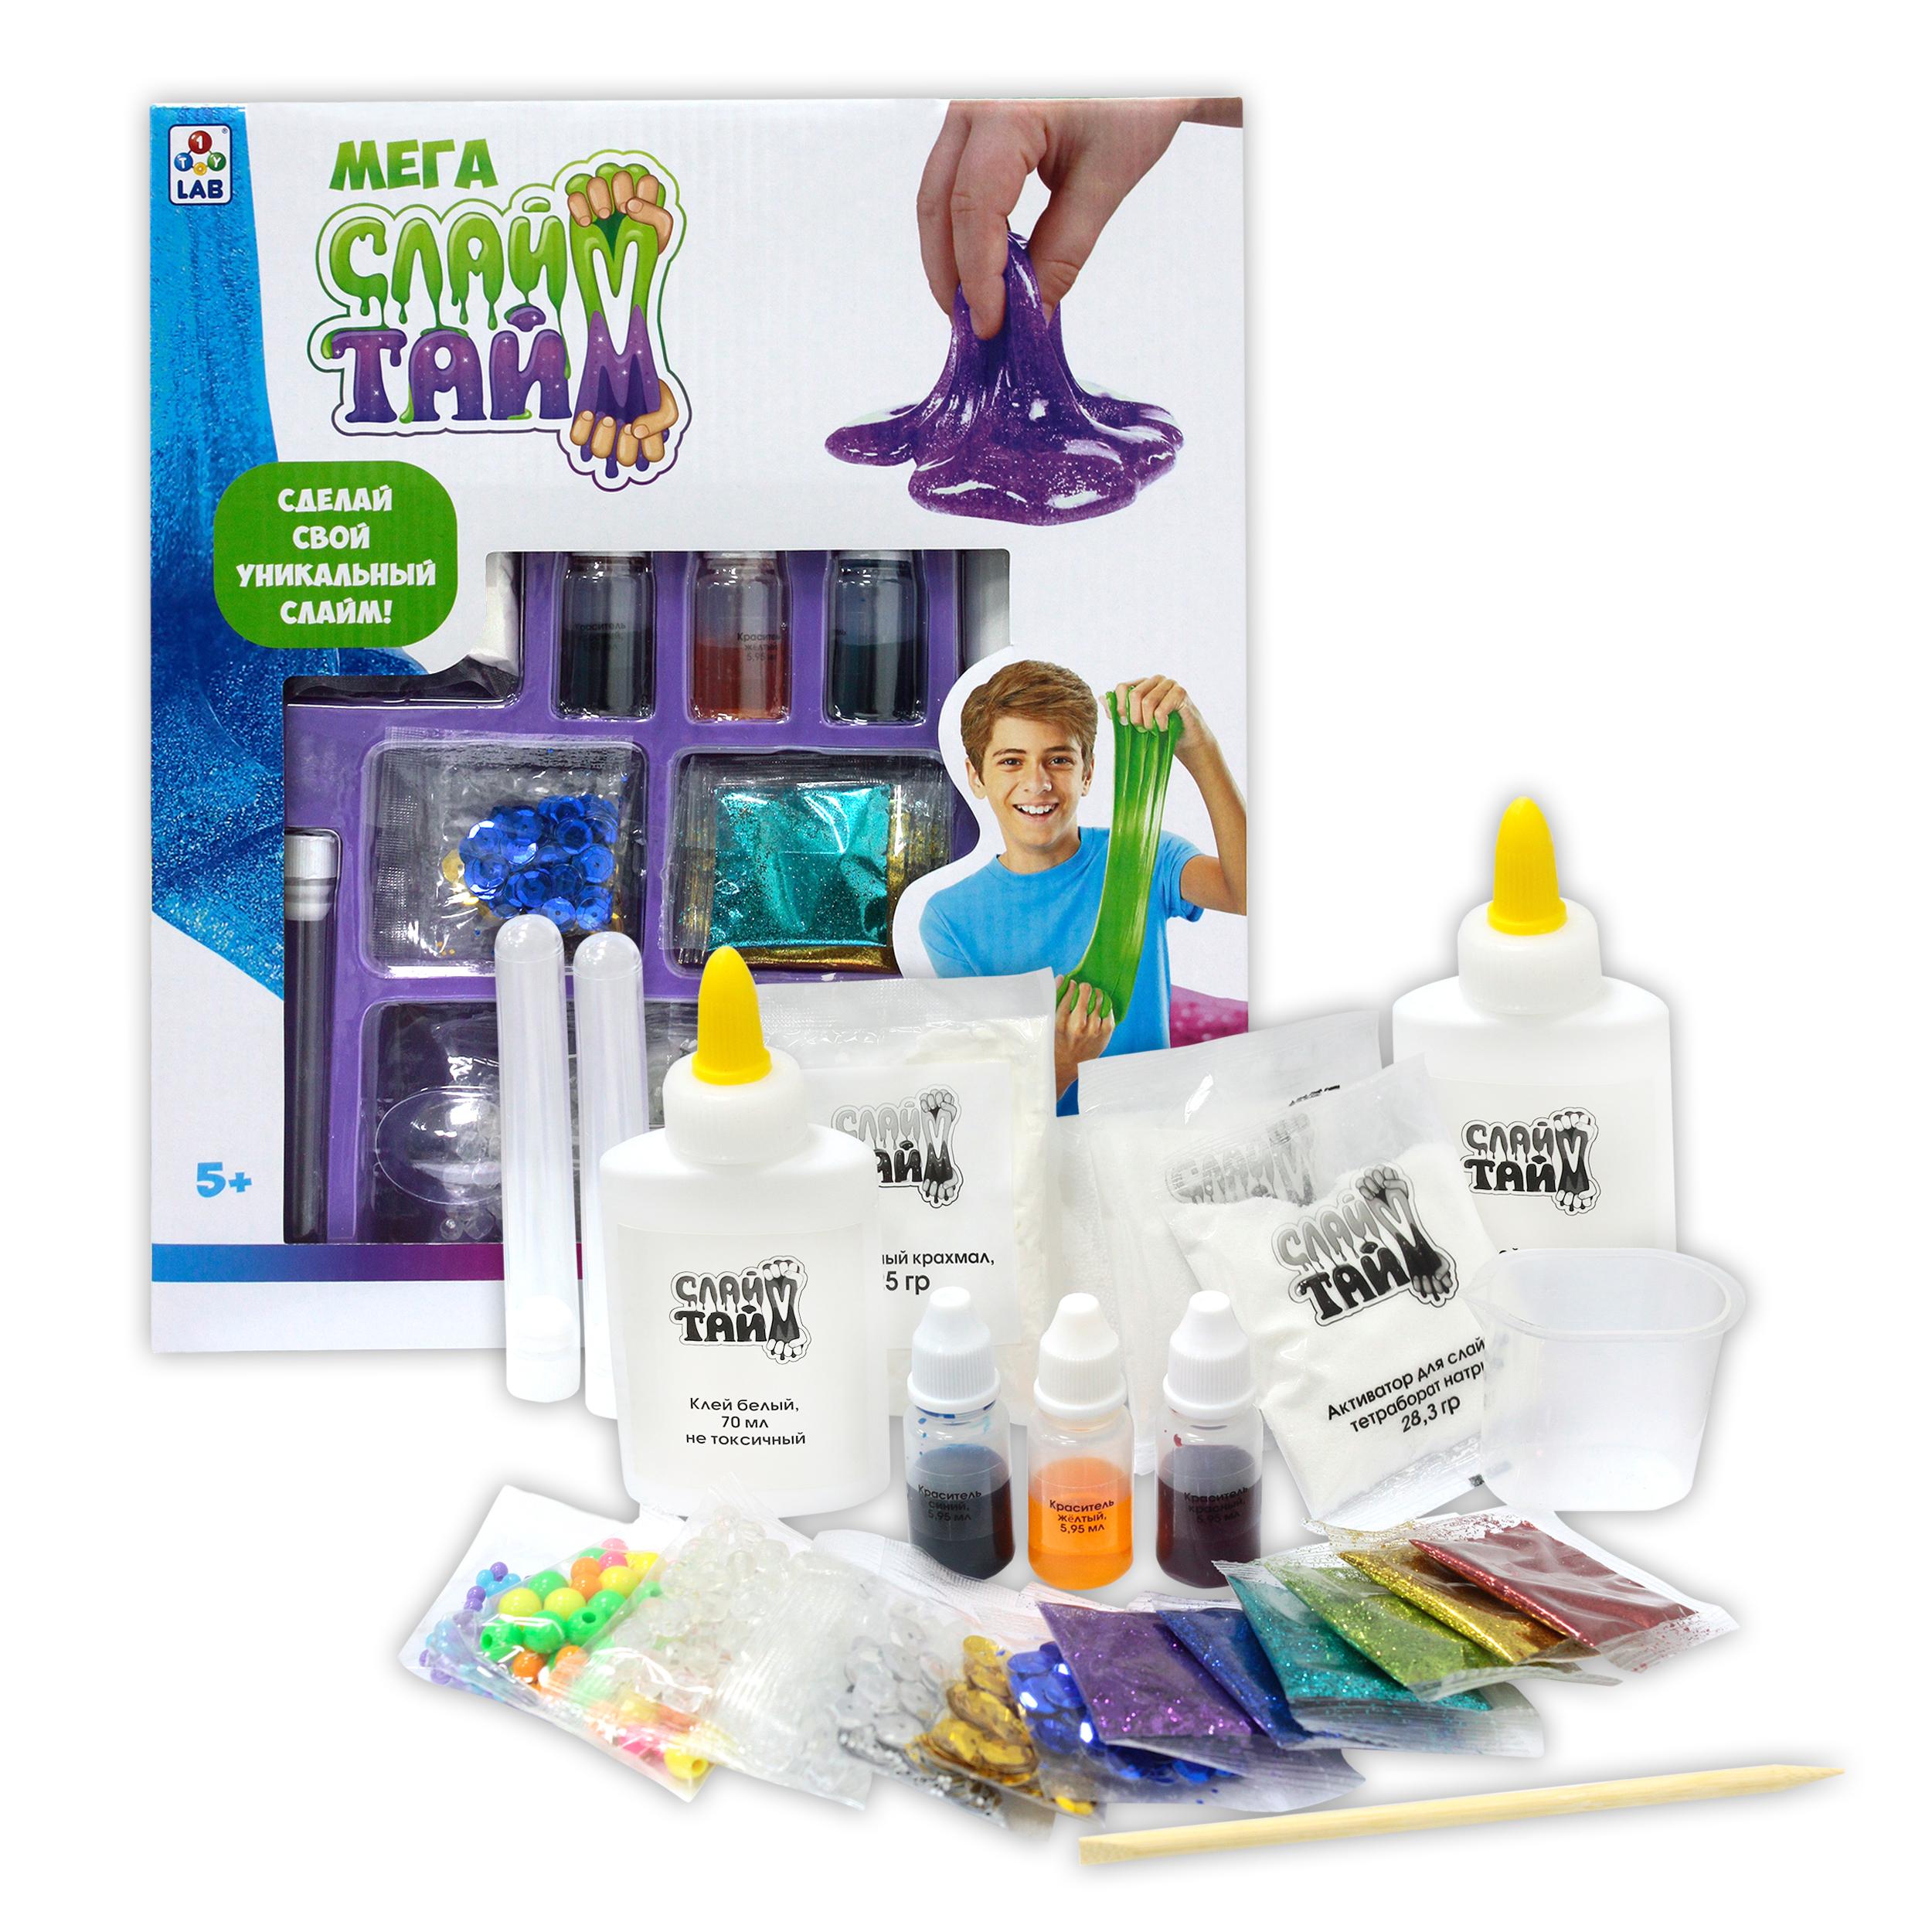 Набор для изготовления слайма 1toy Сделай слайм Т12033 набор для изготовления слайма 1toy сделай слайм многоцветный т12028